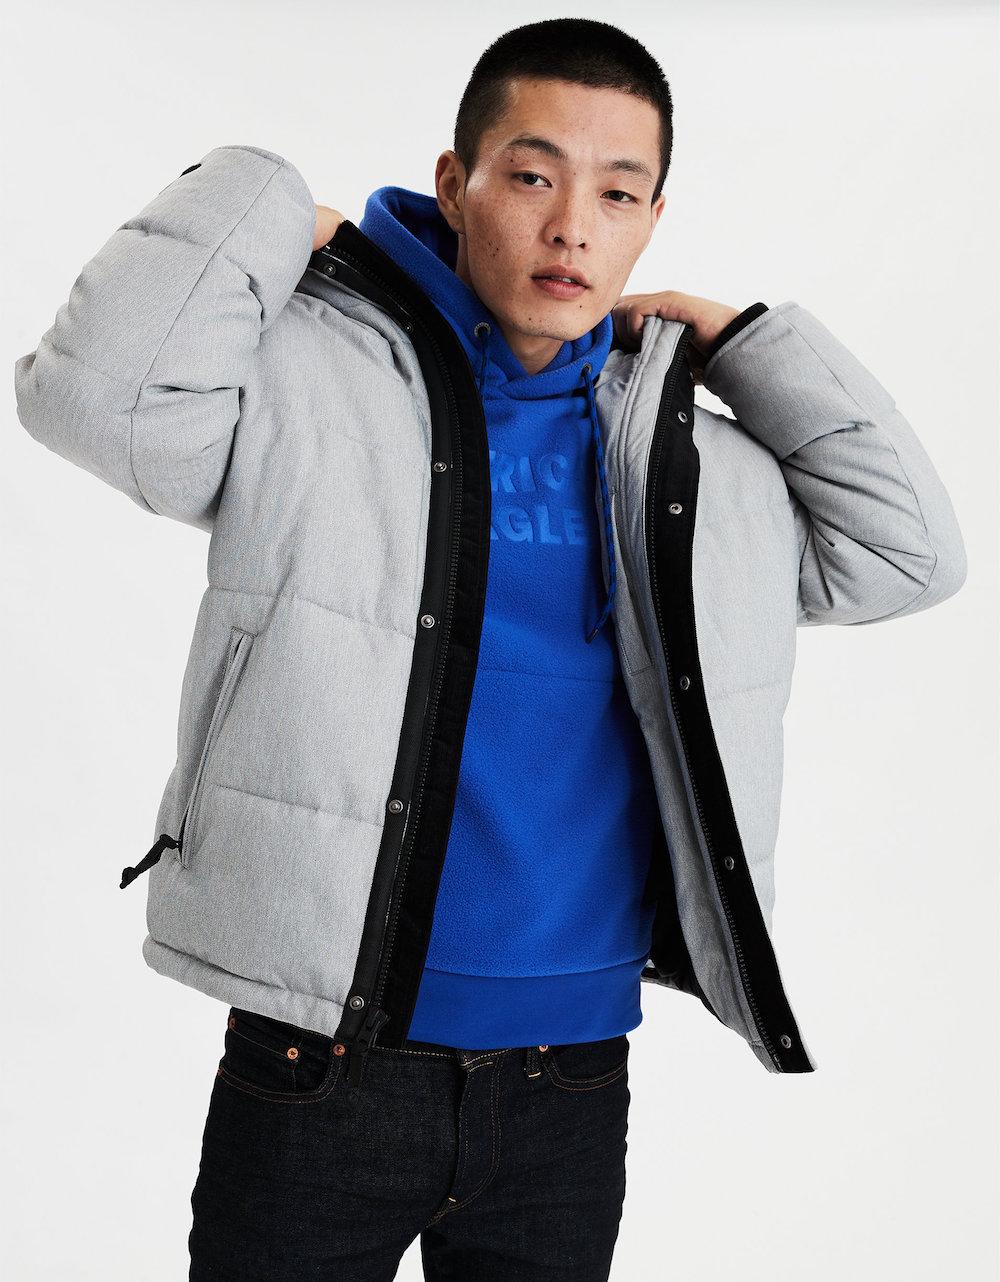 Young man wearing American Eagle Men's Puffer Jacket